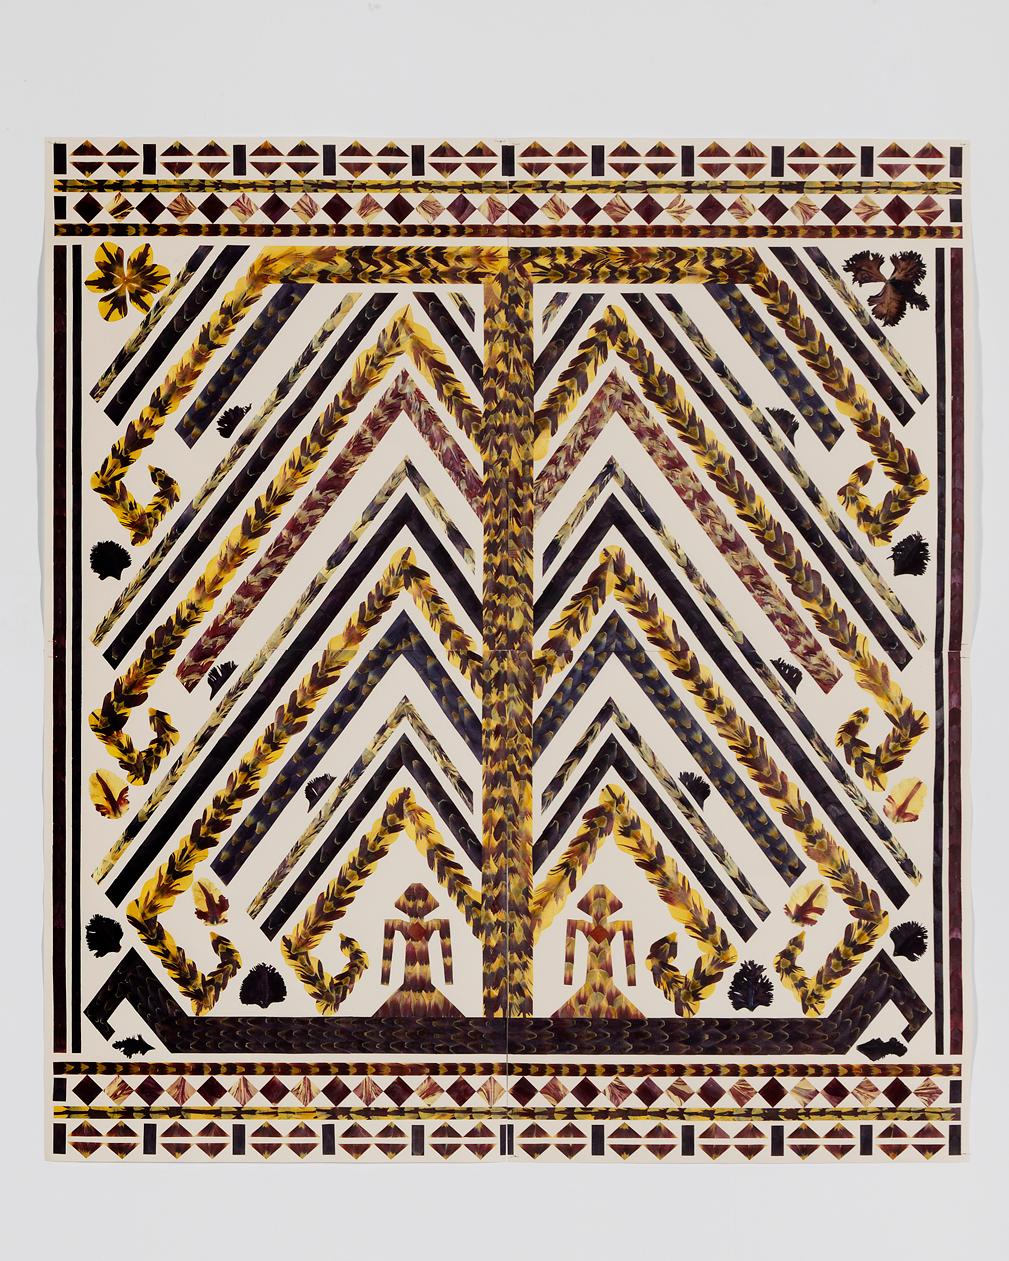 Jennifer Tee, Tampan Tree of Life, tulip petals collage on paper, 2016.